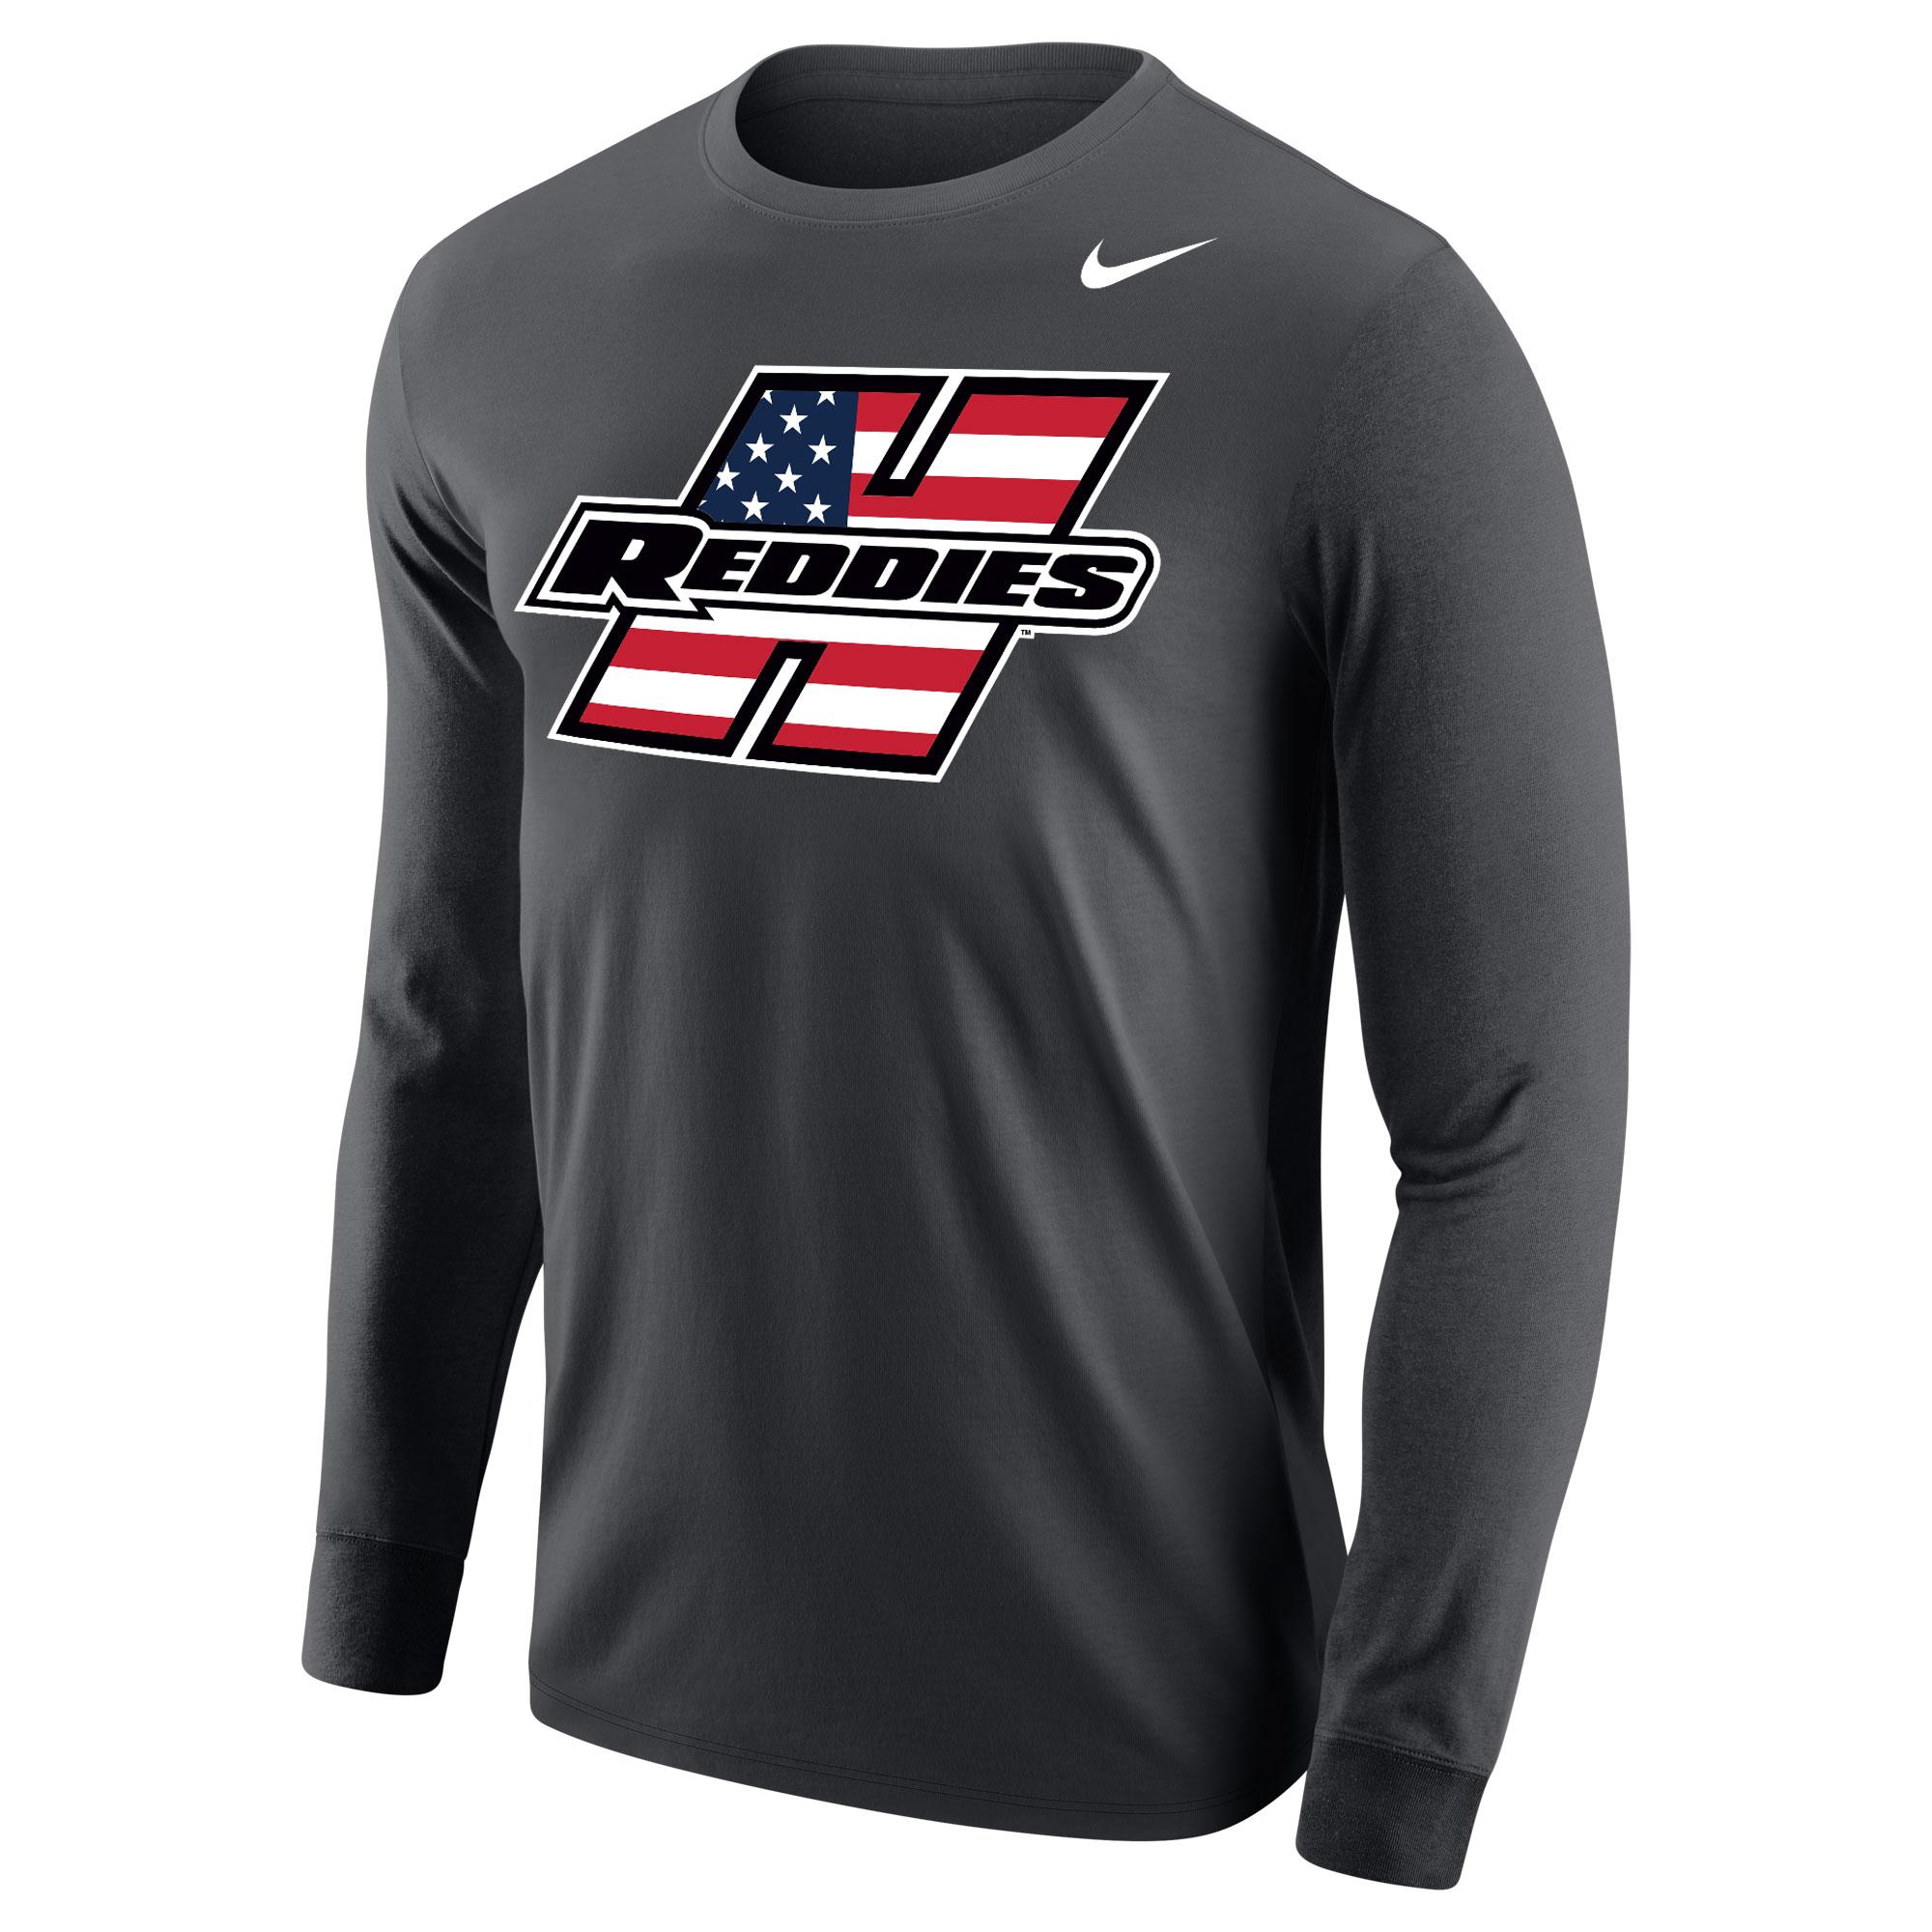 Henderson Reddies American Flag Men's Core Long Sleeve T-Shirt